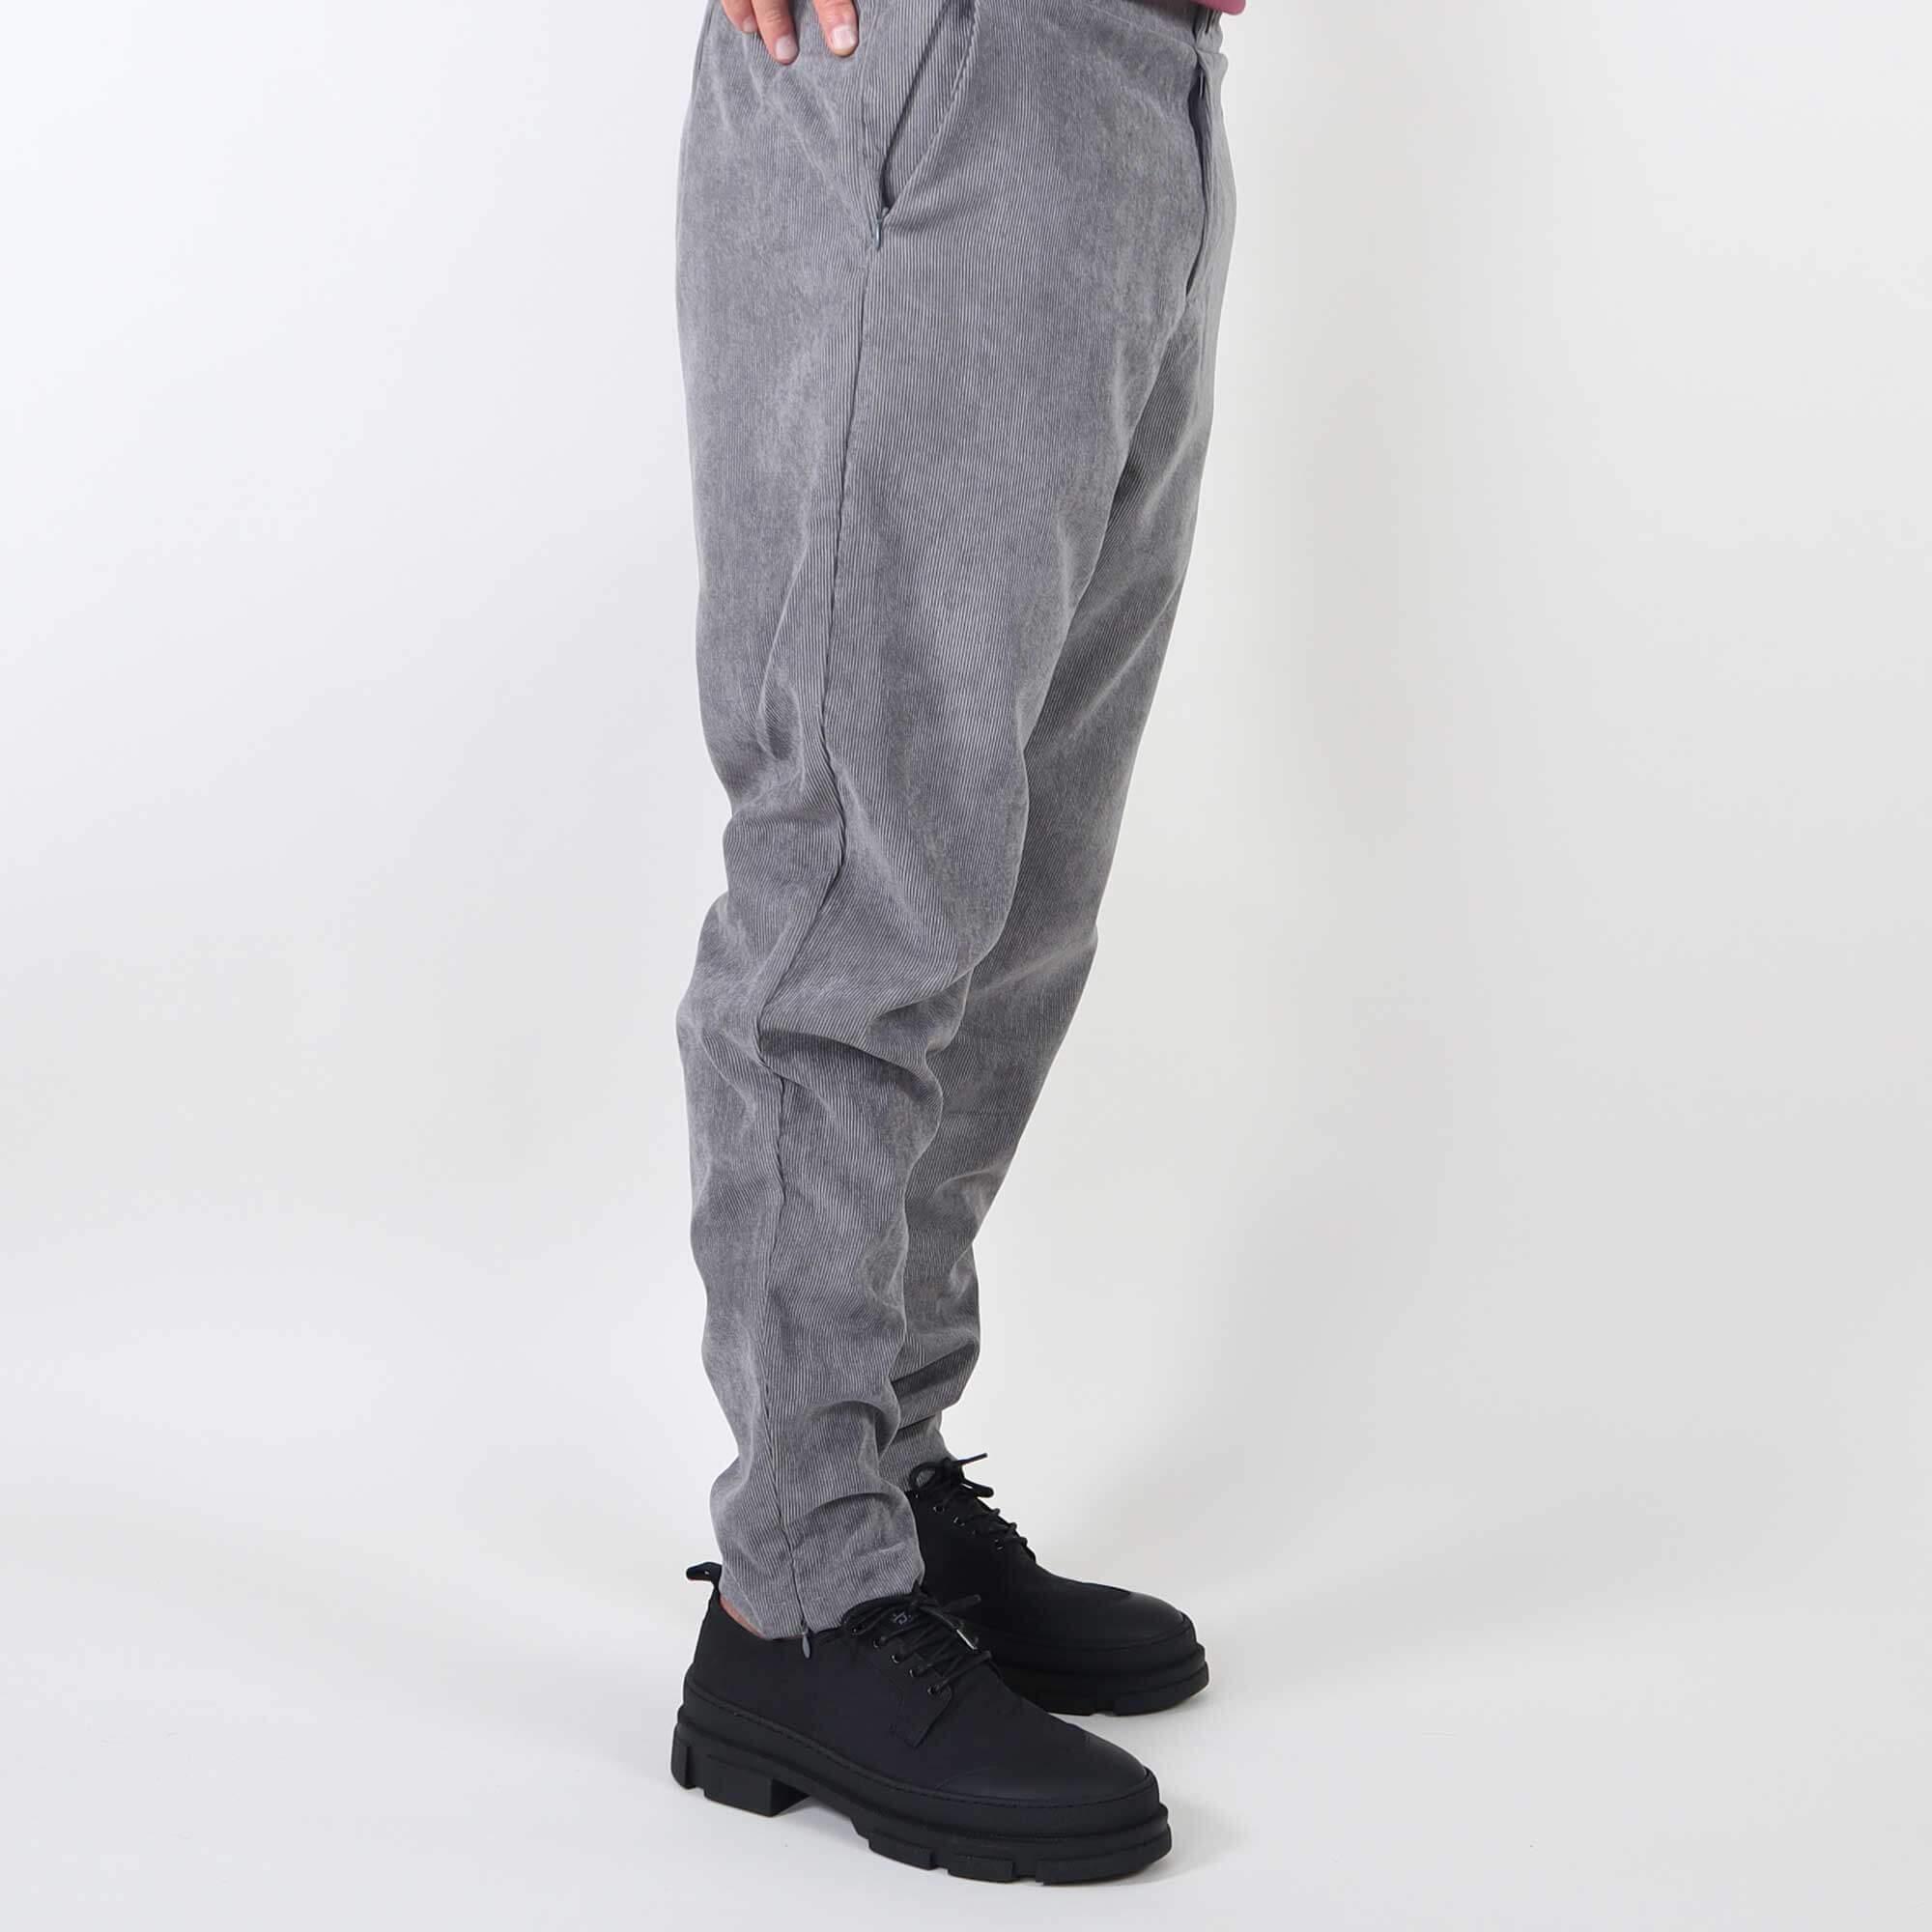 pantalon-rib-lgrey-4